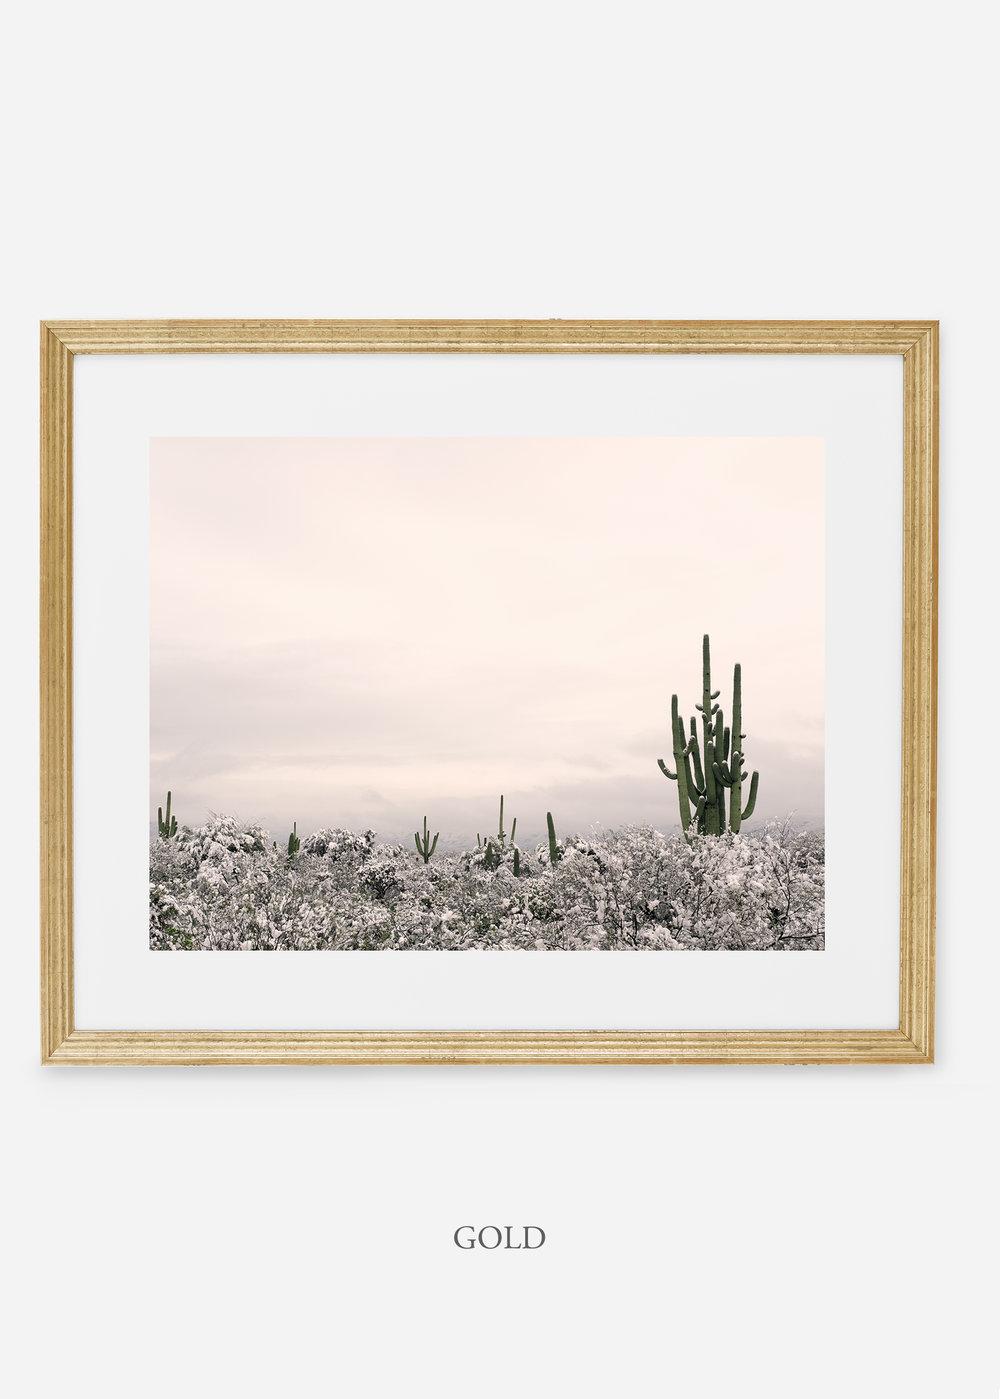 goldframe-saguaroNo.7-wildercalifornia-art-wallart-cactusprint-homedecor-prints-arizona-botanical-artwork-interiordesign.jpg